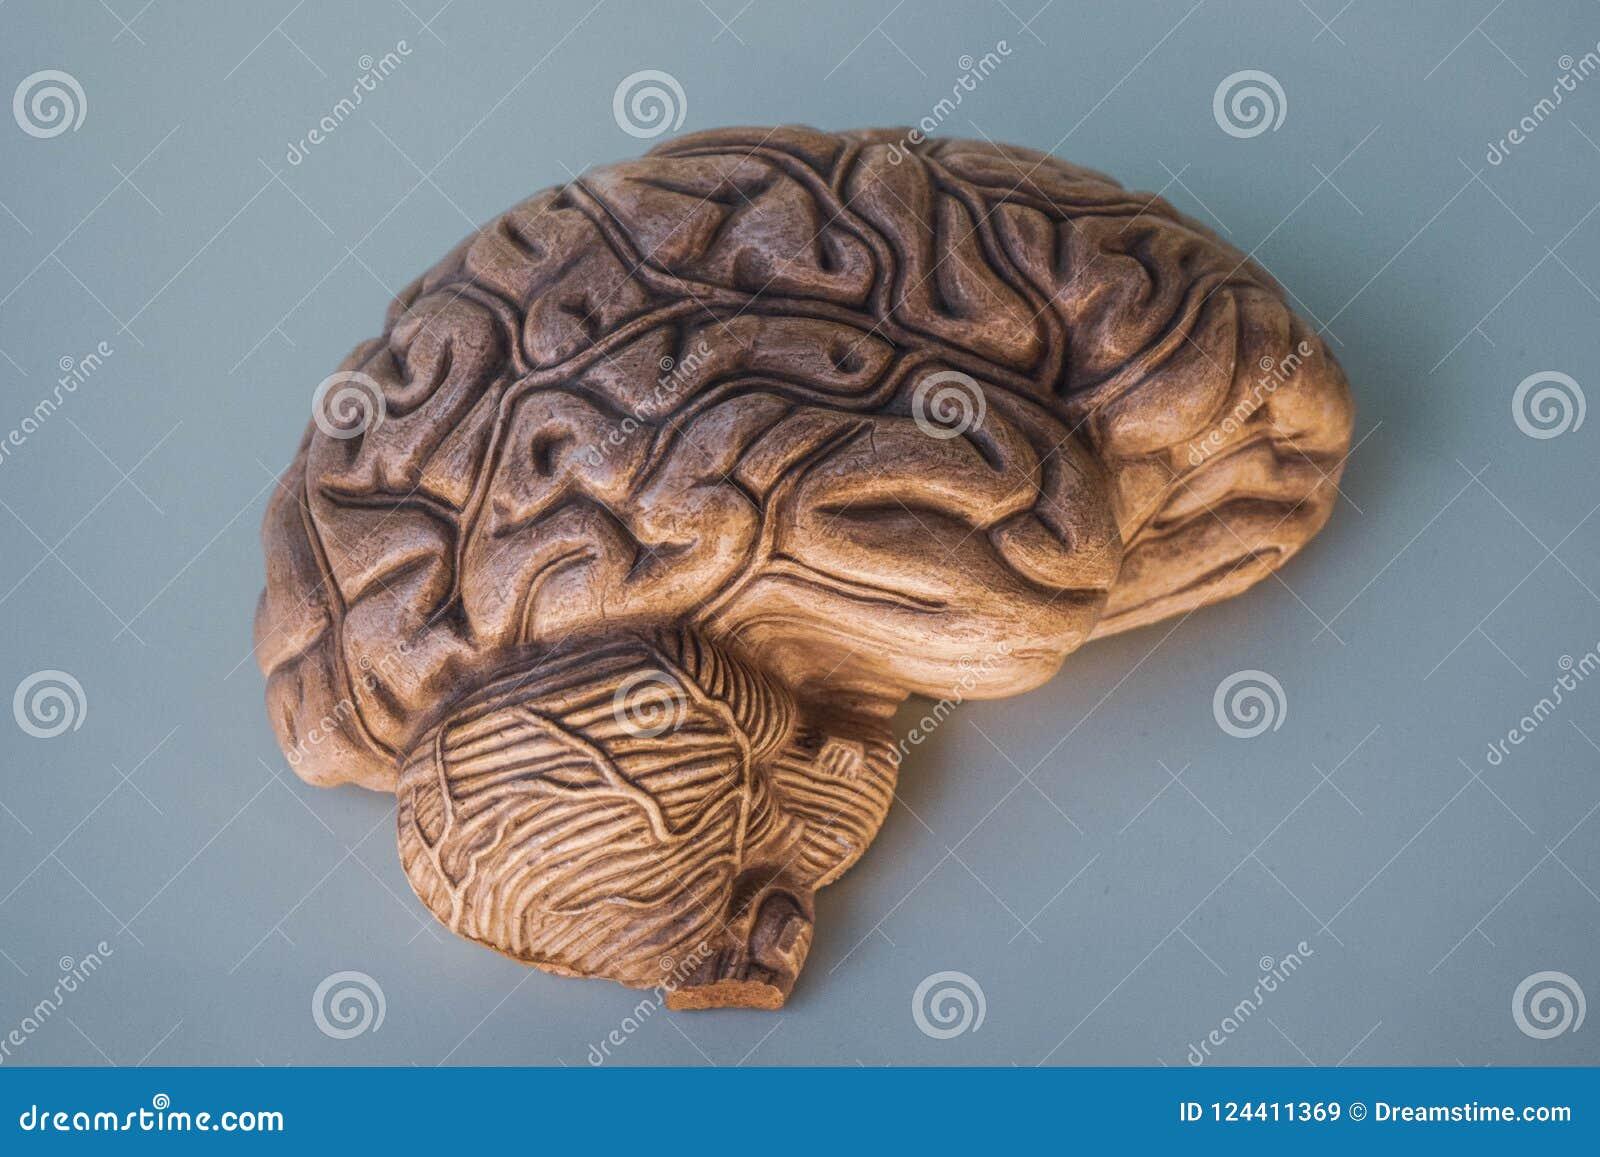 Hemisphere Of Brain, In 3D. Stock Image - Image of anatomy, model ...